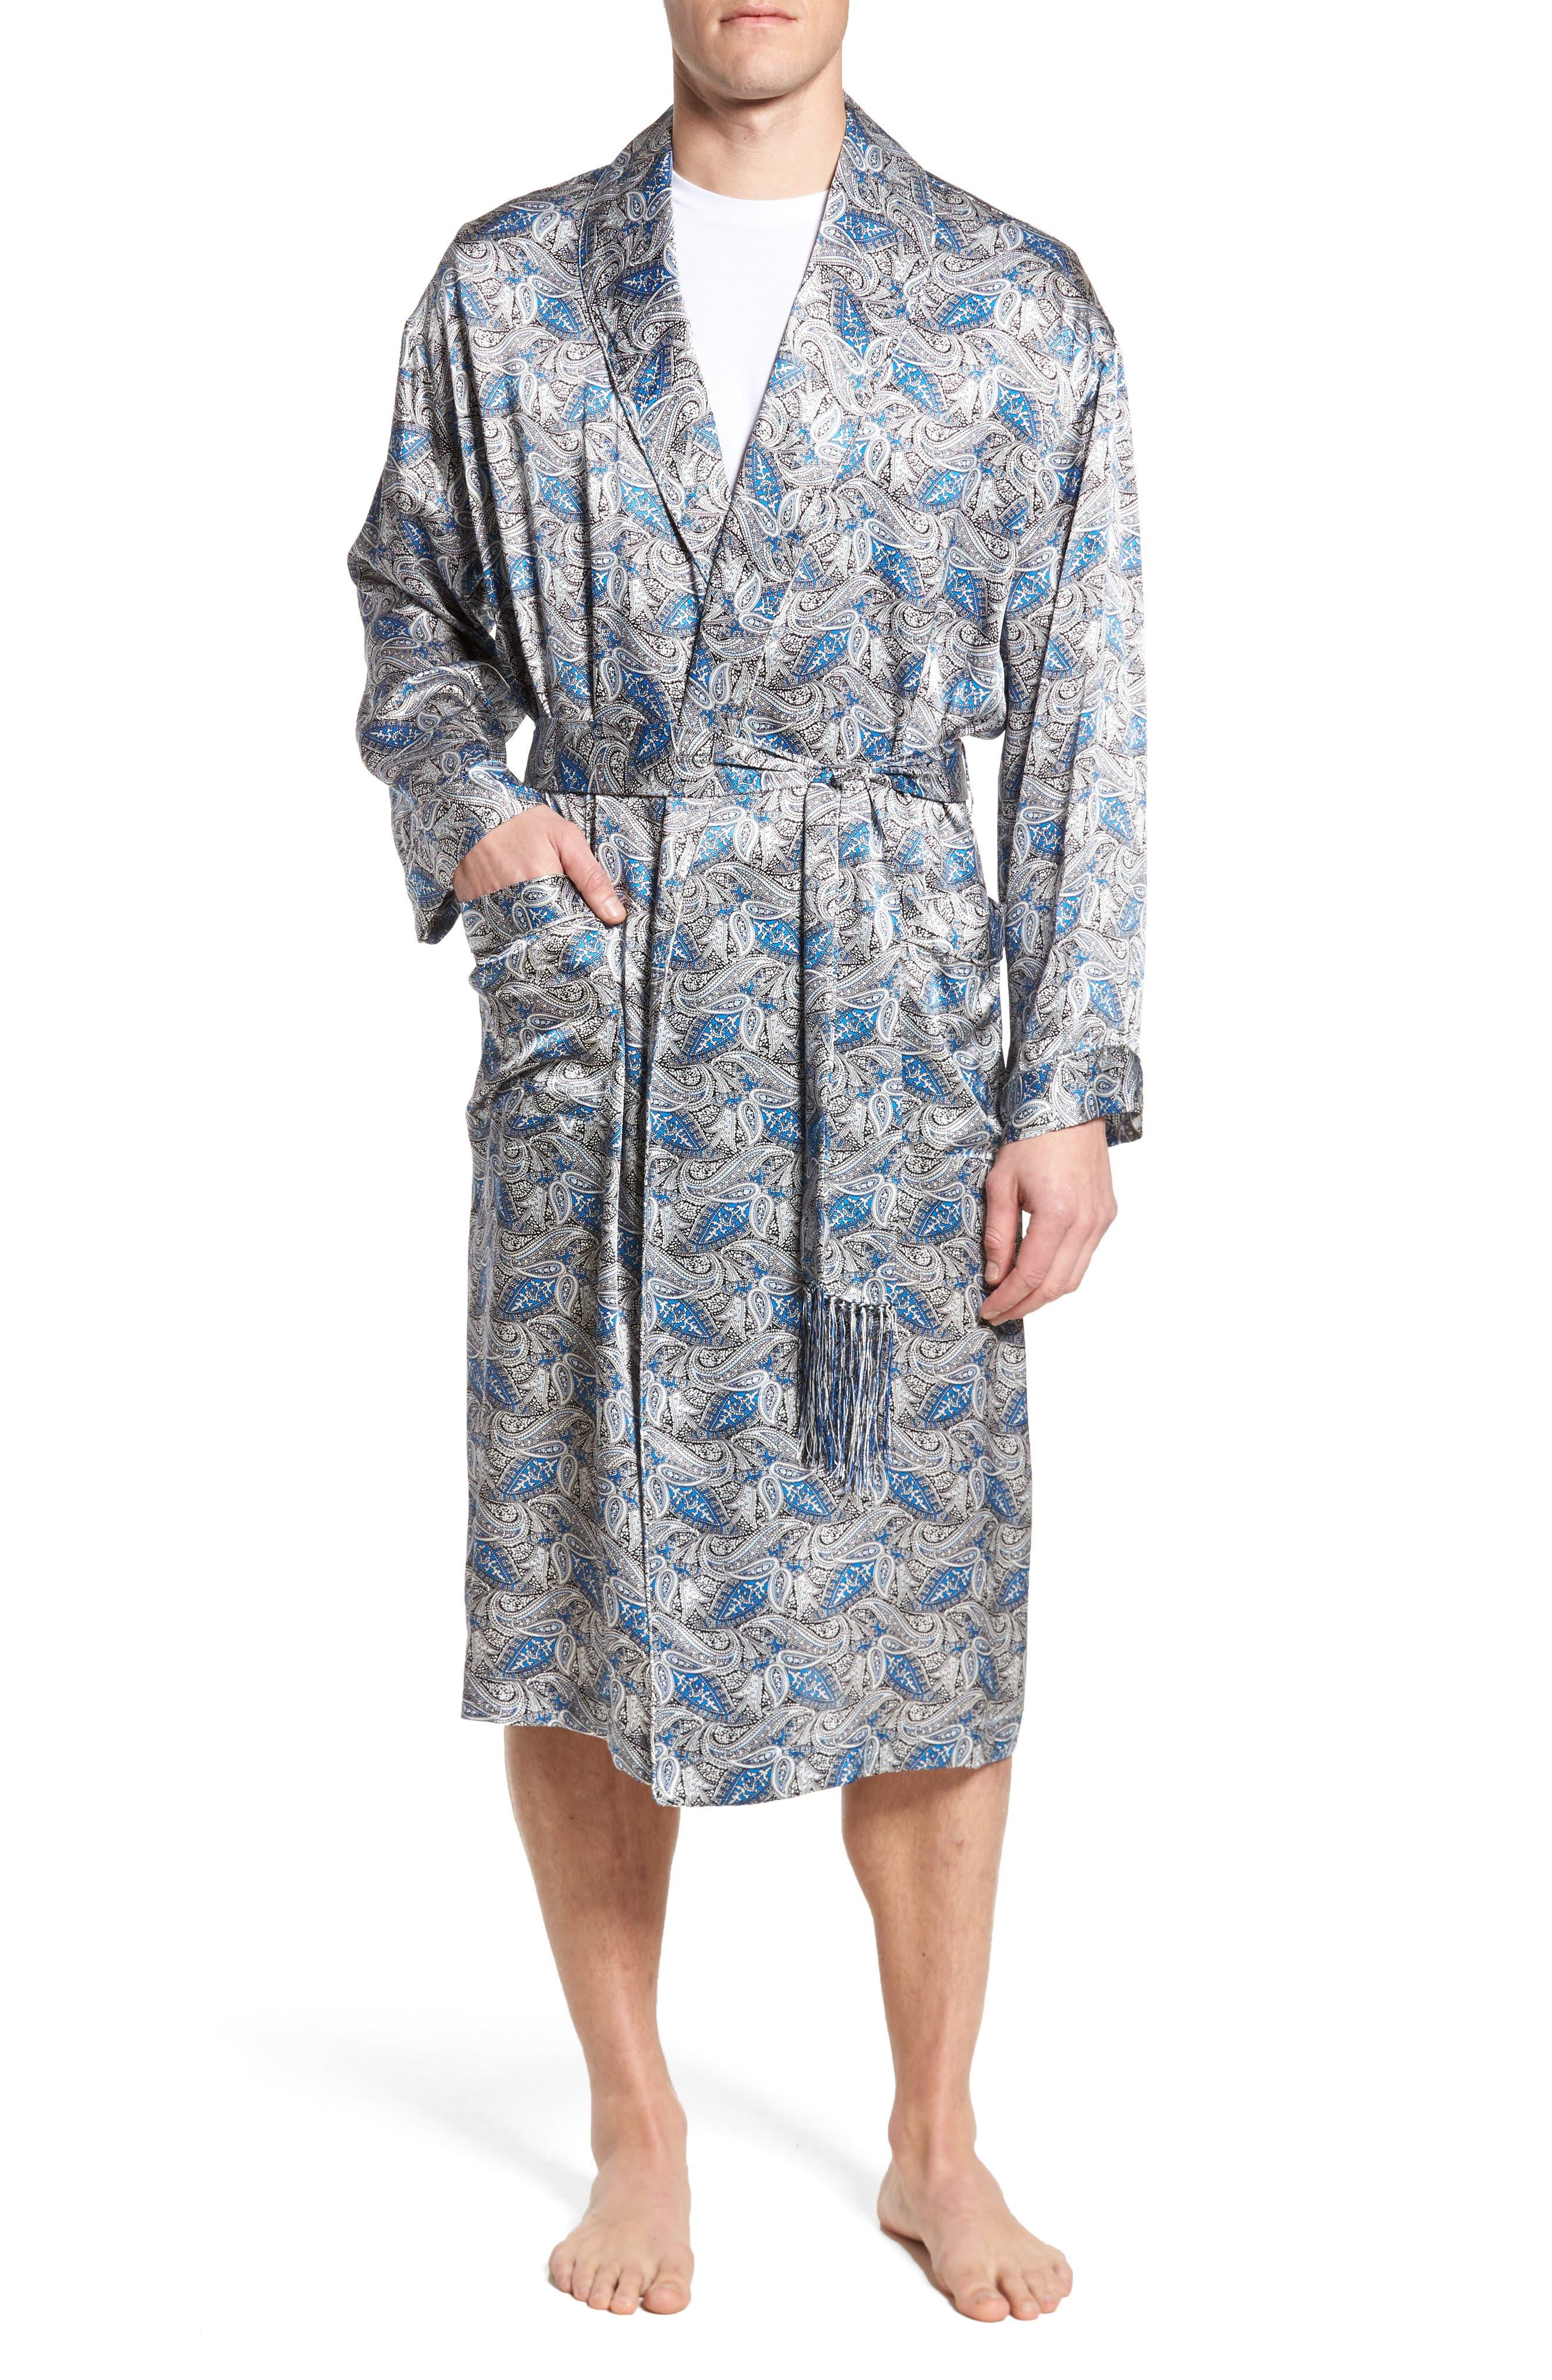 1930s Men's Fashion Guide- What Did Men Wear? Mens Majestic International Cypress Silk Paisley Robe $325.00 AT vintagedancer.com